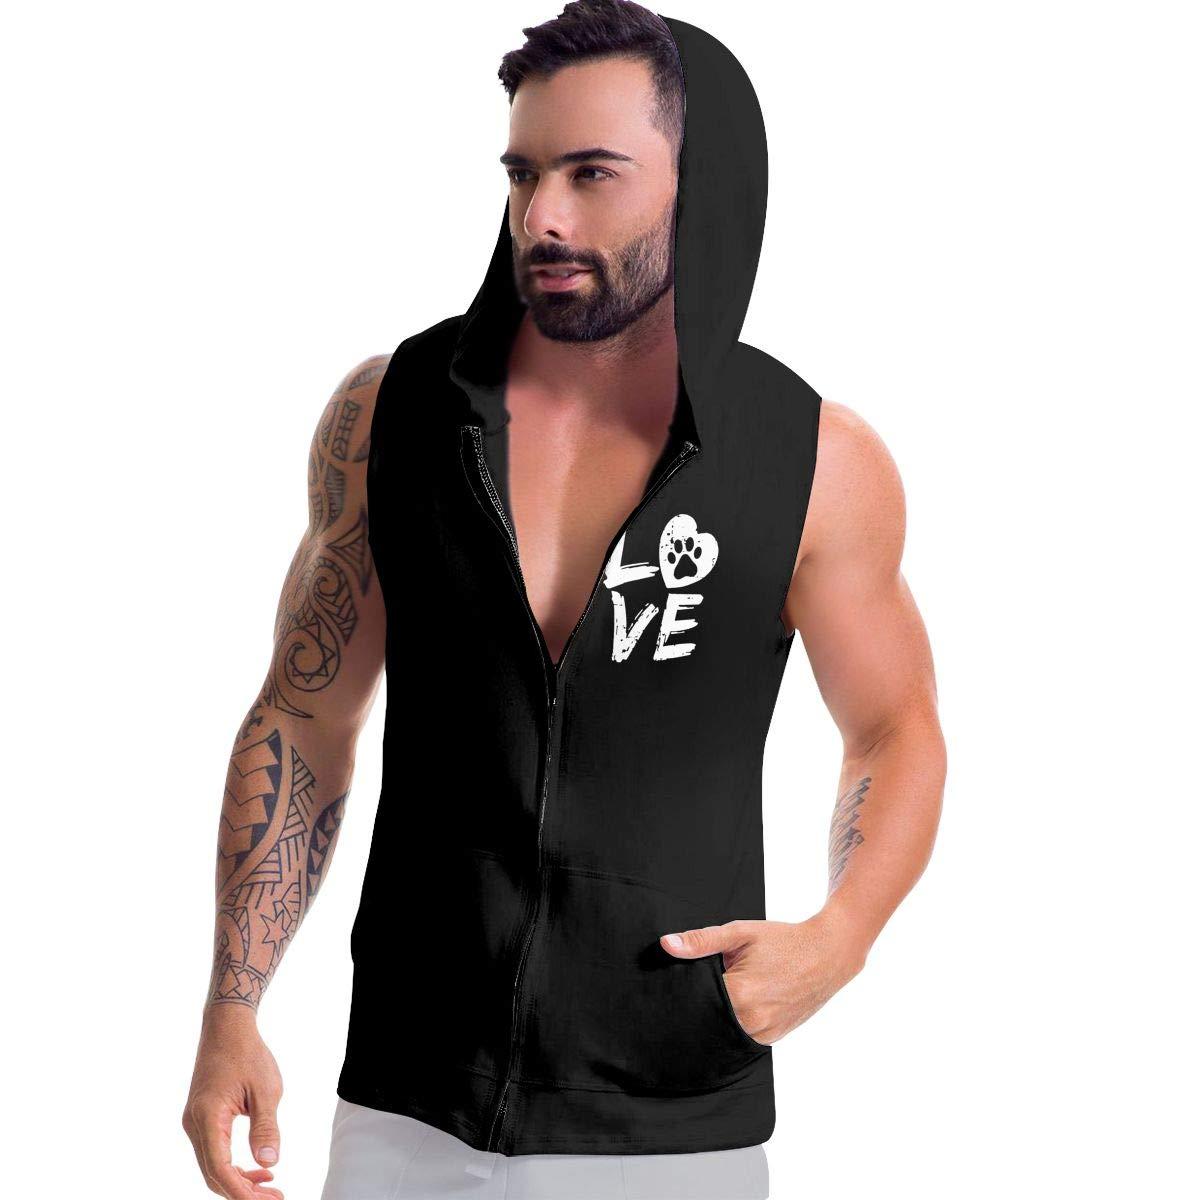 Love Paw Print in Heart Zip Up Tank Tops Mens Sleeveless Sweatshirt